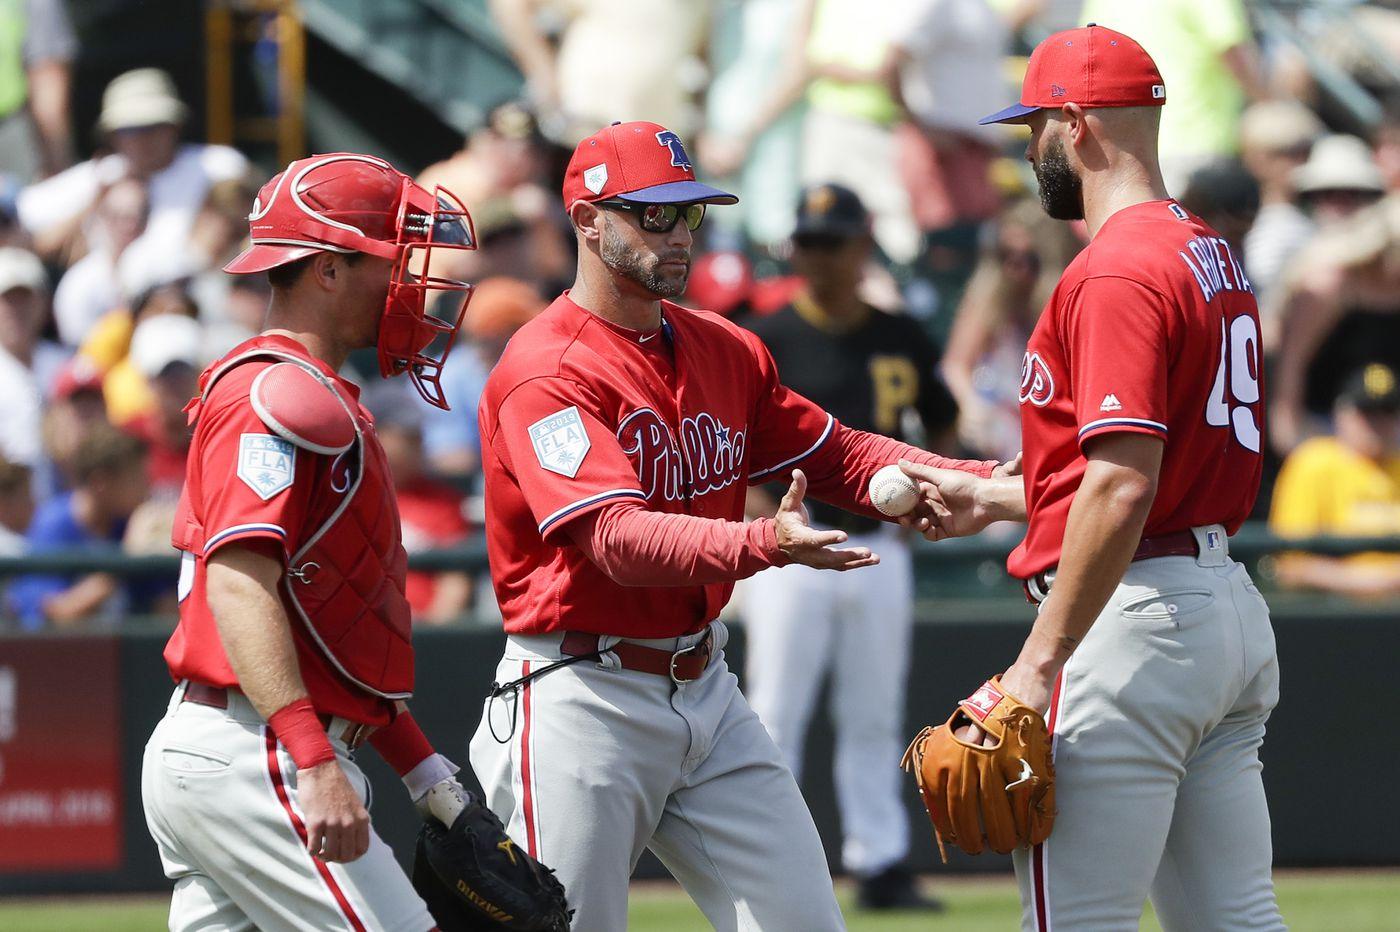 Phillies' Gabe Kapler agrees with Jake Arrieta's rip of team's 'flat' performance